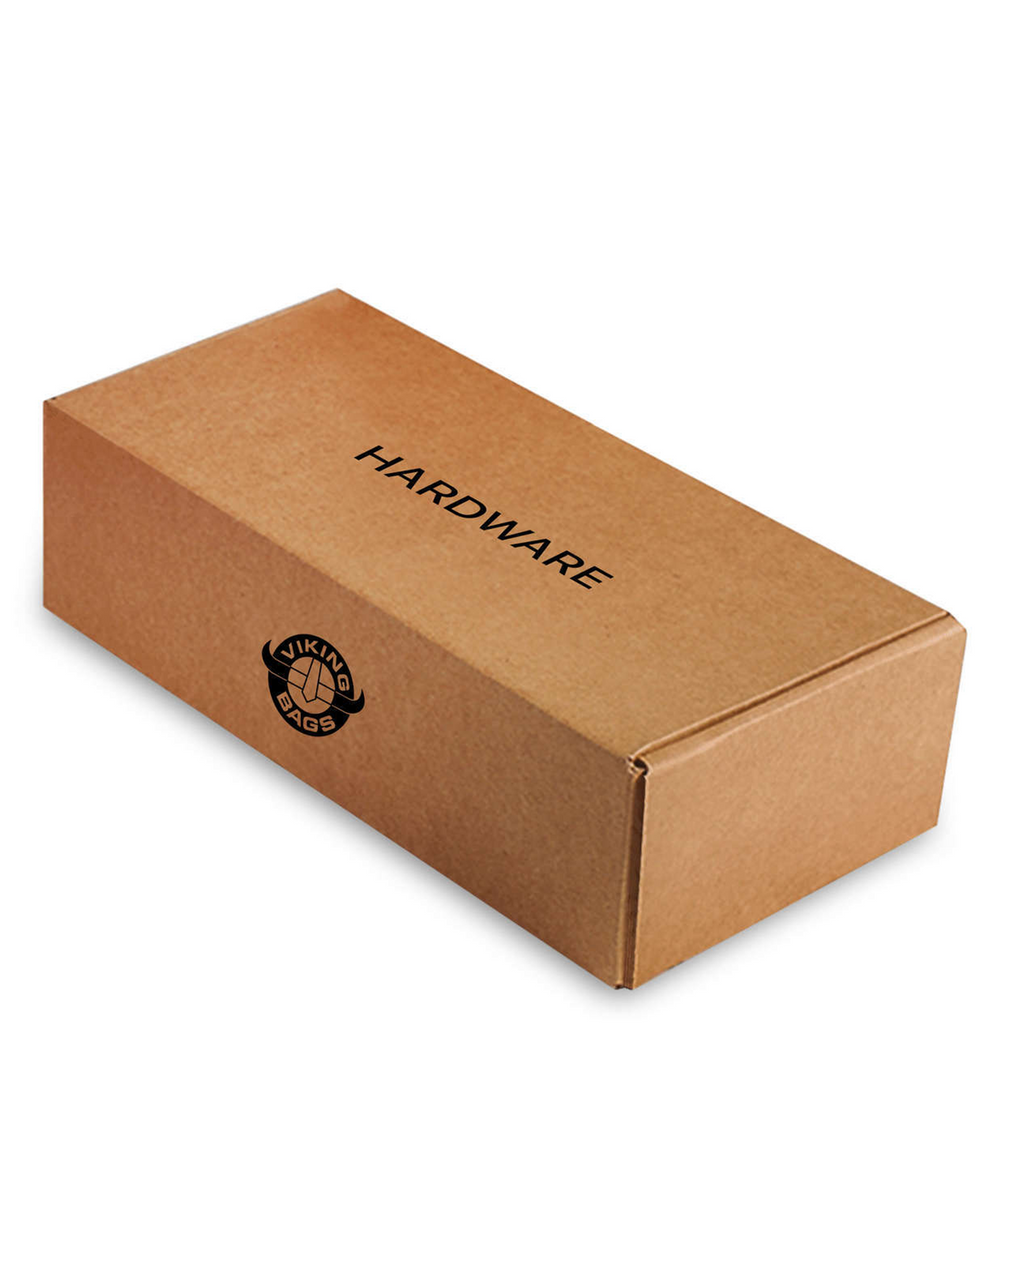 Boulevard C90, VL1500 SS Side Pocket Saddlebags Hardware Box